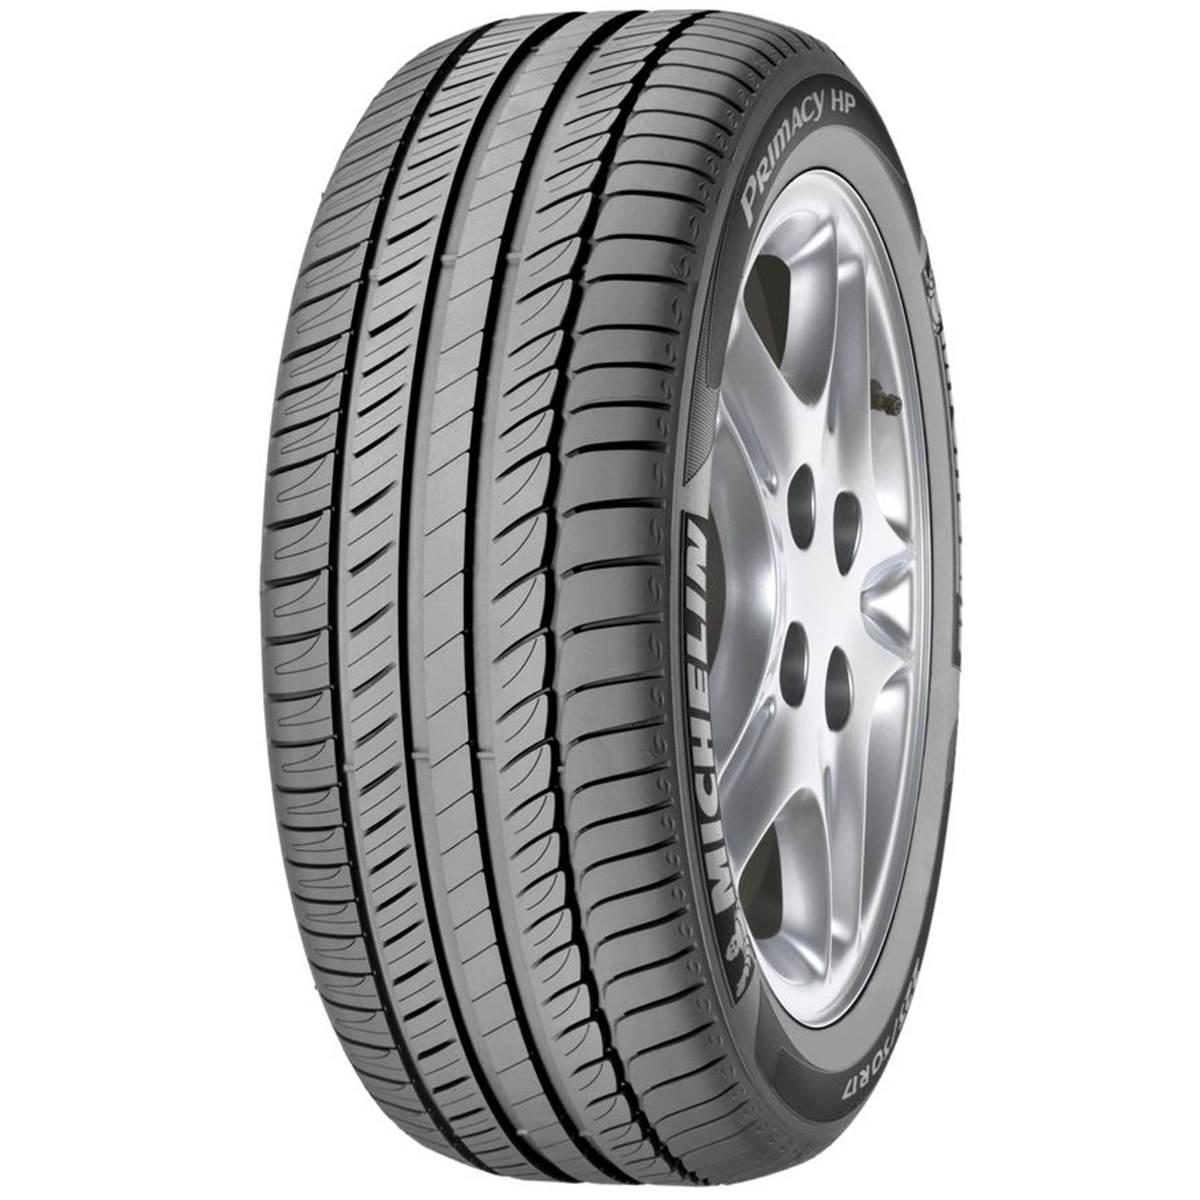 Pneu Michelin 245/40R17 91Y Primacy Hp